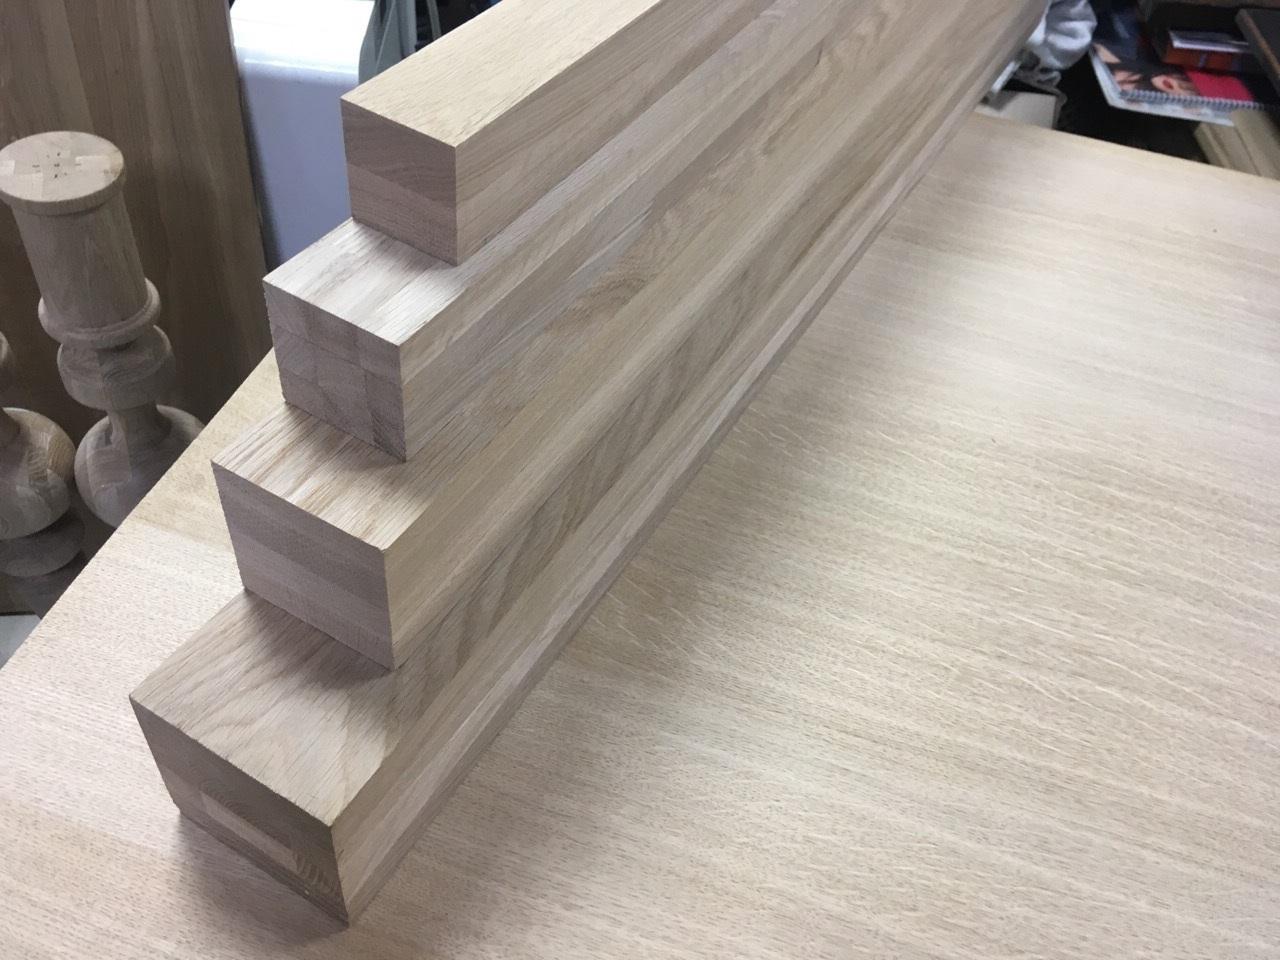 Мебельный брус - дуб цельноламельный 50 мм х 50 мм х 900 мм